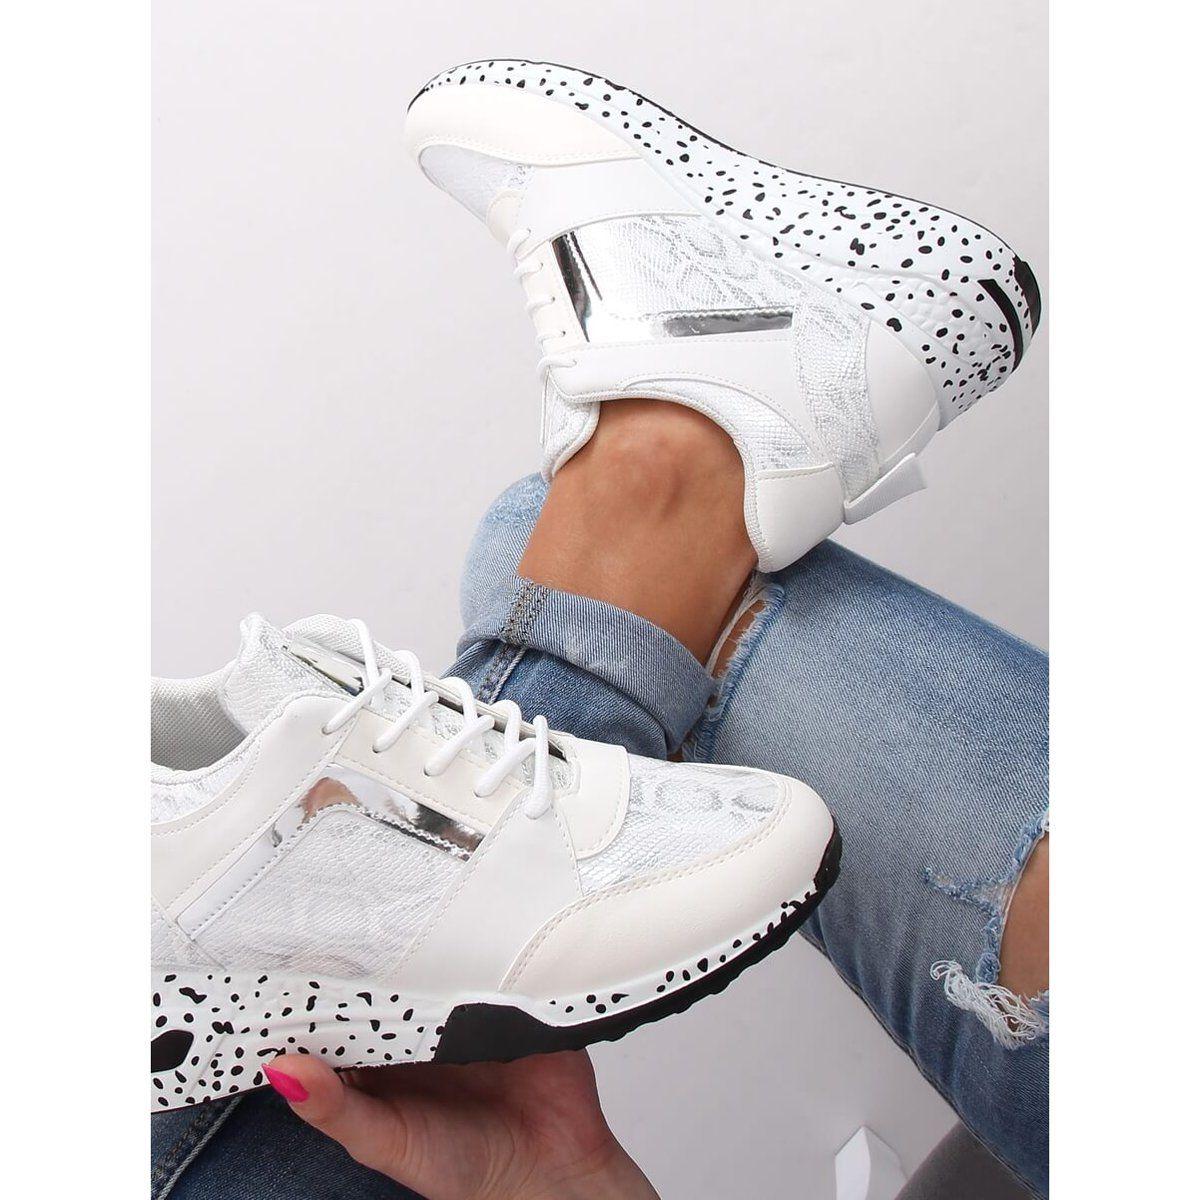 Buty Sportowe Na Koturnie Biale C131 Blanco White Sneaker Shoes Sneakers